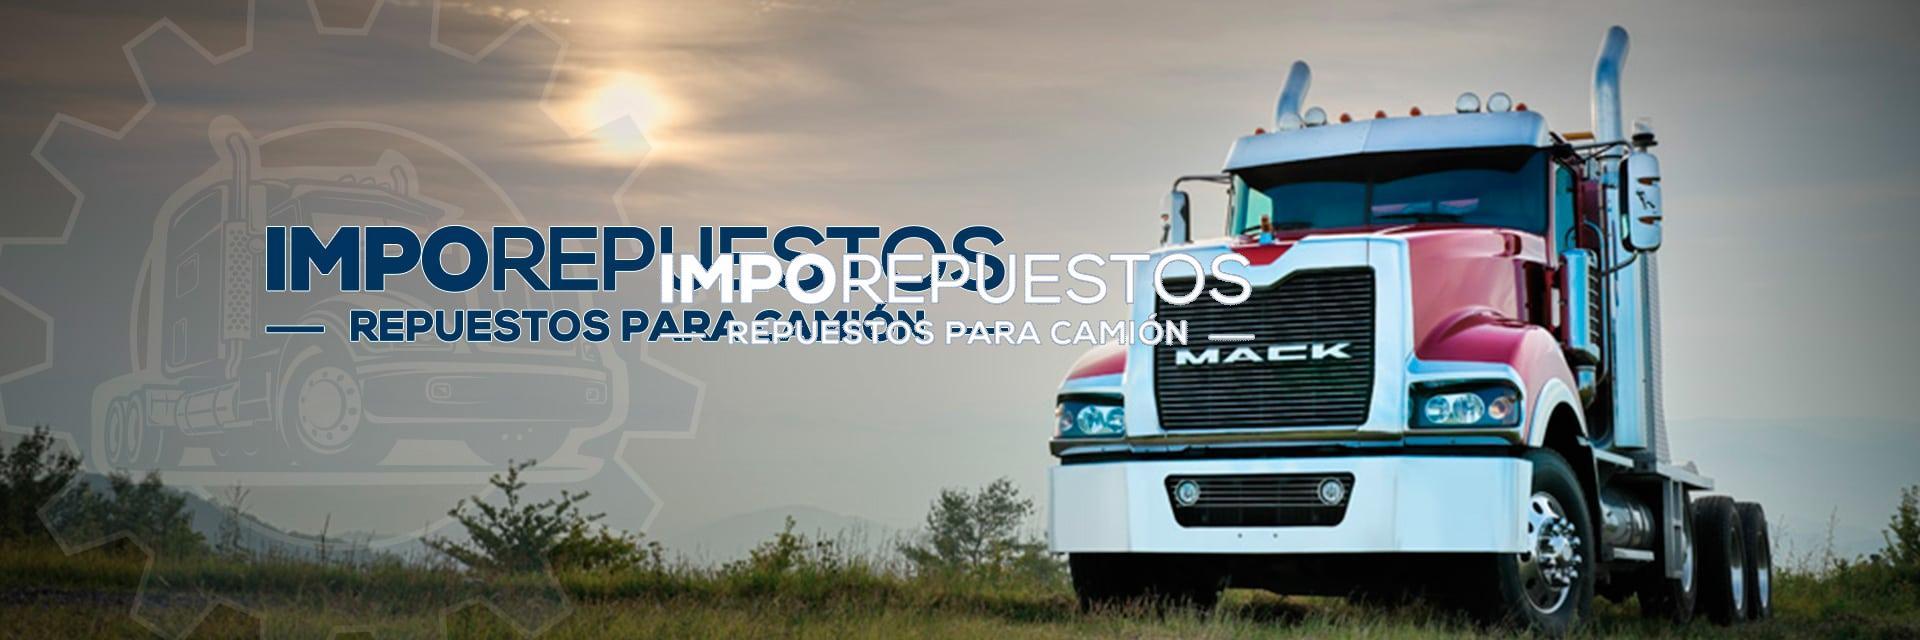 imporepuestos para camion